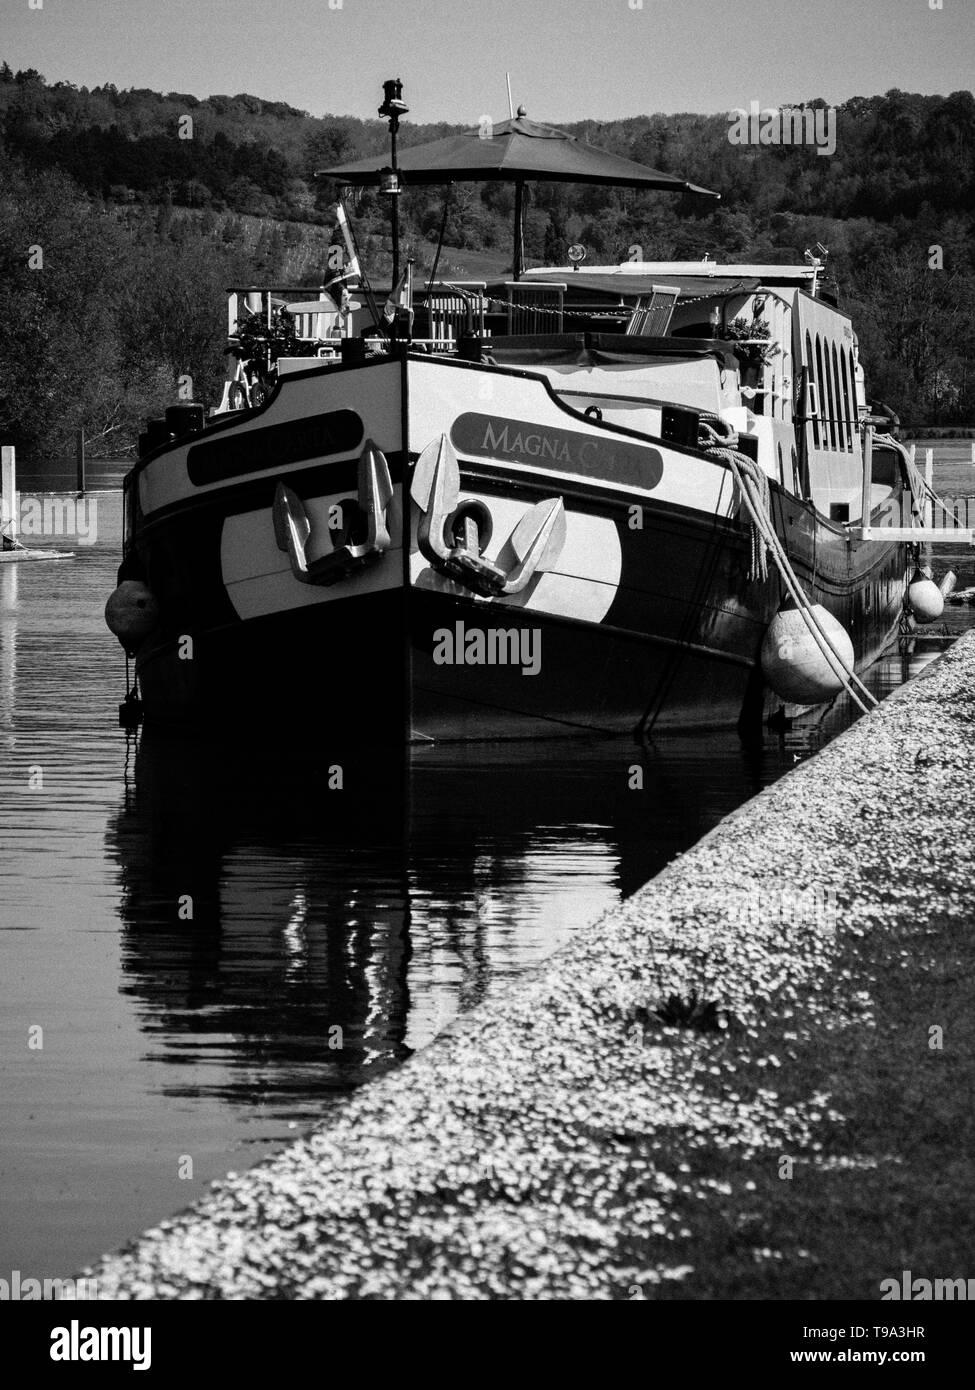 Magna Carta Boat, on River Thames, nr Henley-on-Thames, Oxfordshire, England, UK, GB. - Stock Image